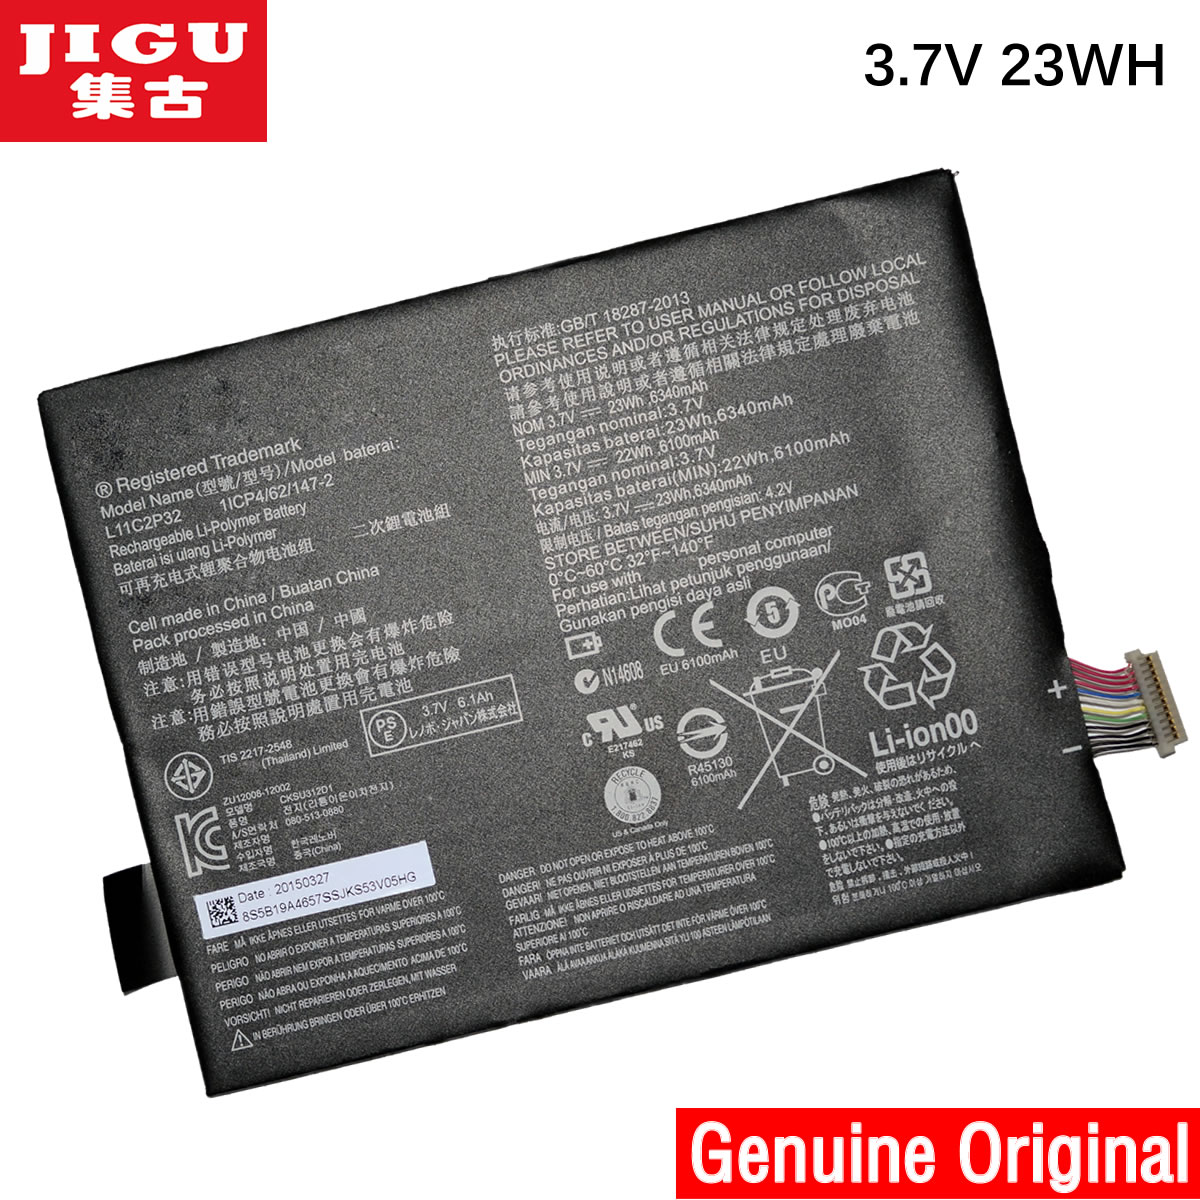 Lenovo S6000d Tablet Инструкция